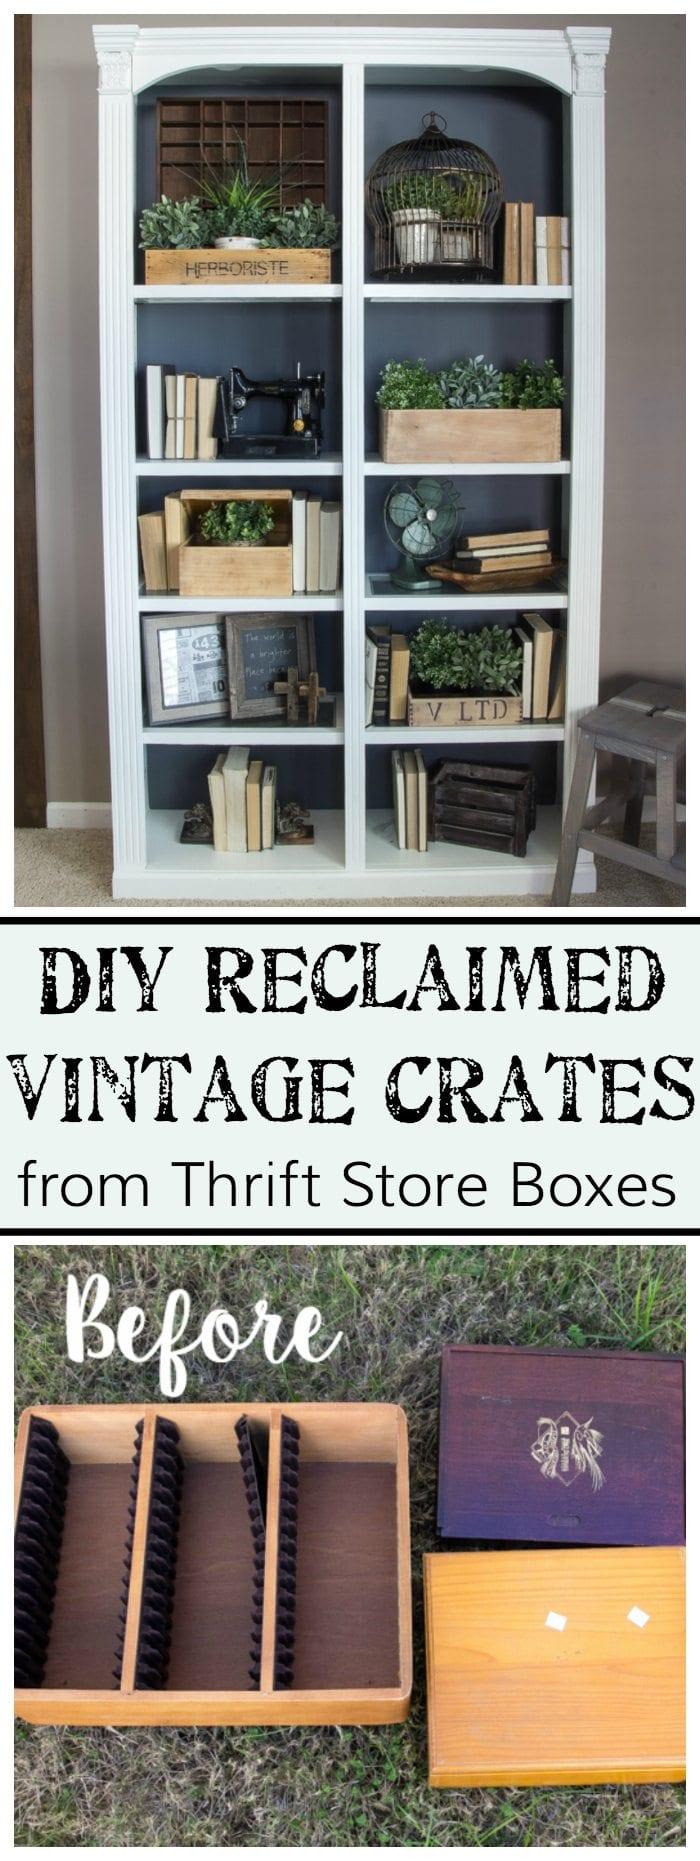 DIY Reclaimed Vintage Crates